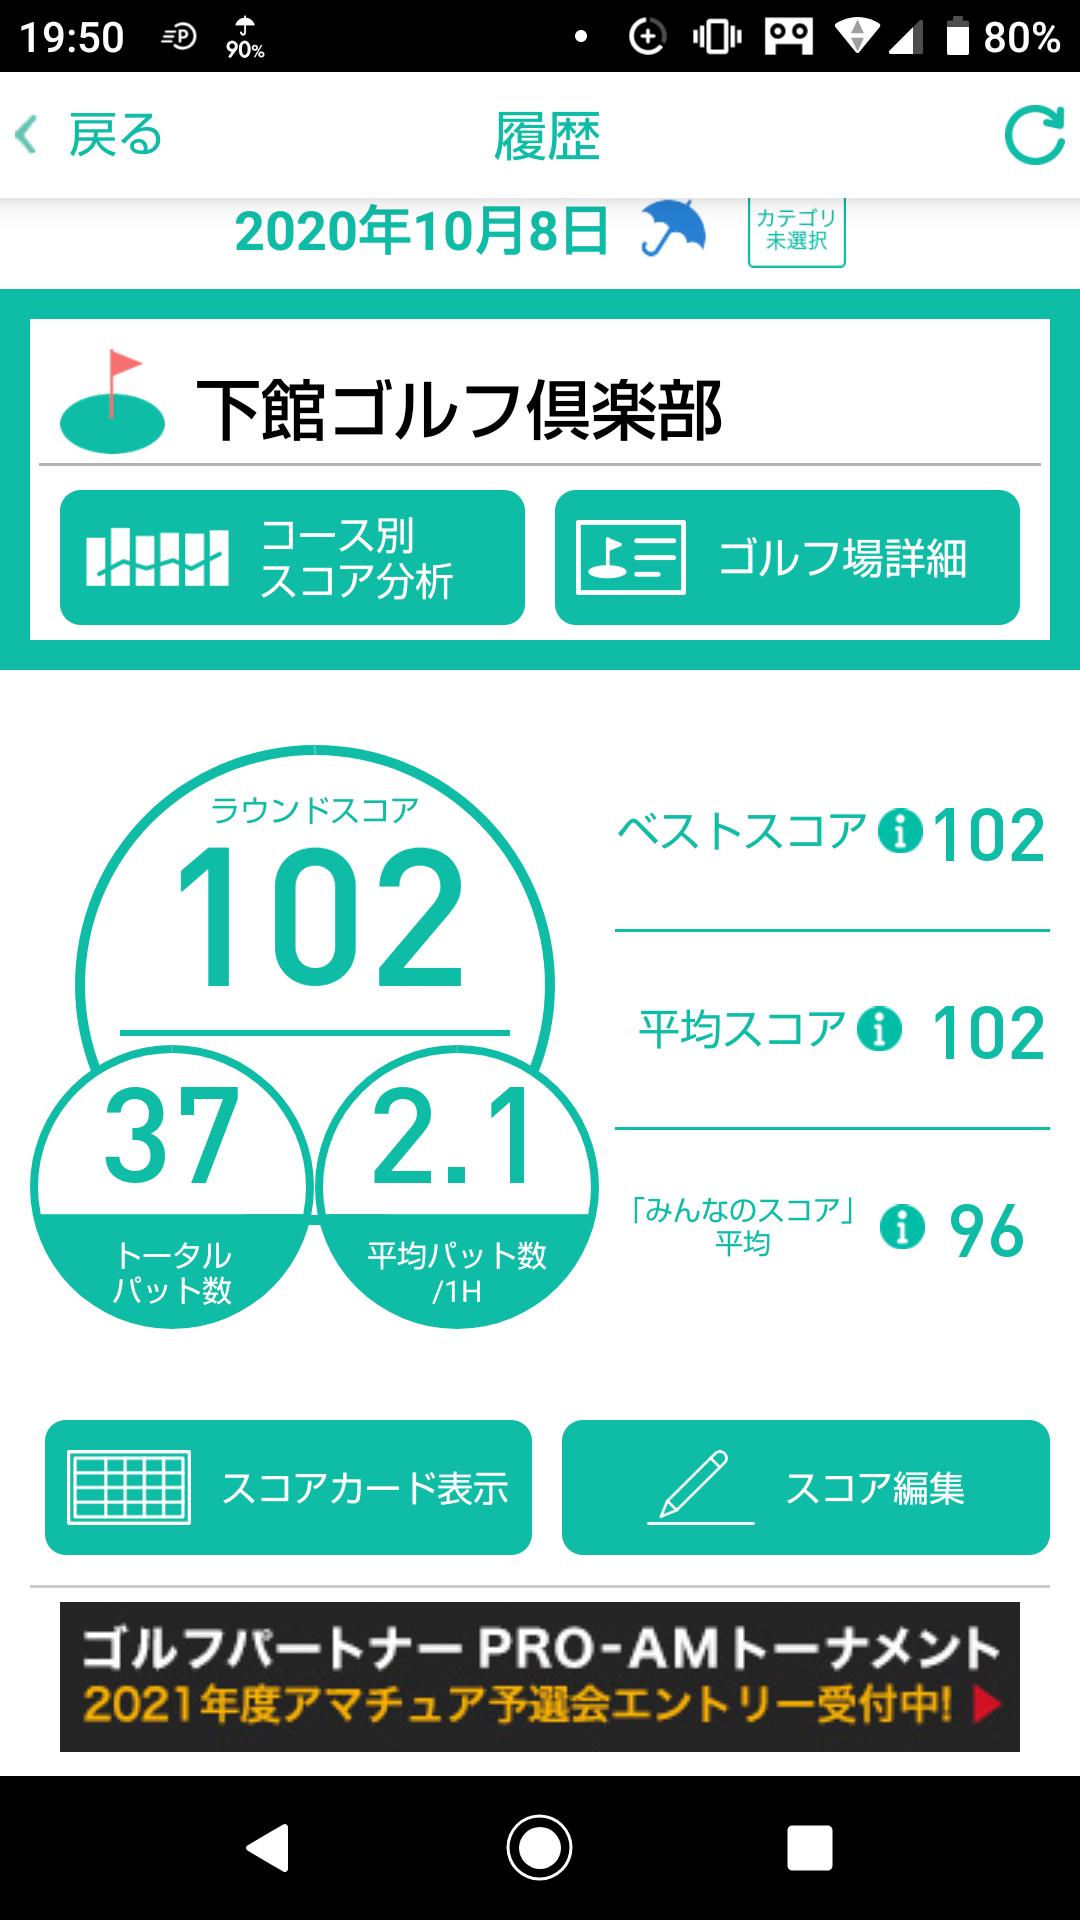 Screenshot_20201008-195053.png